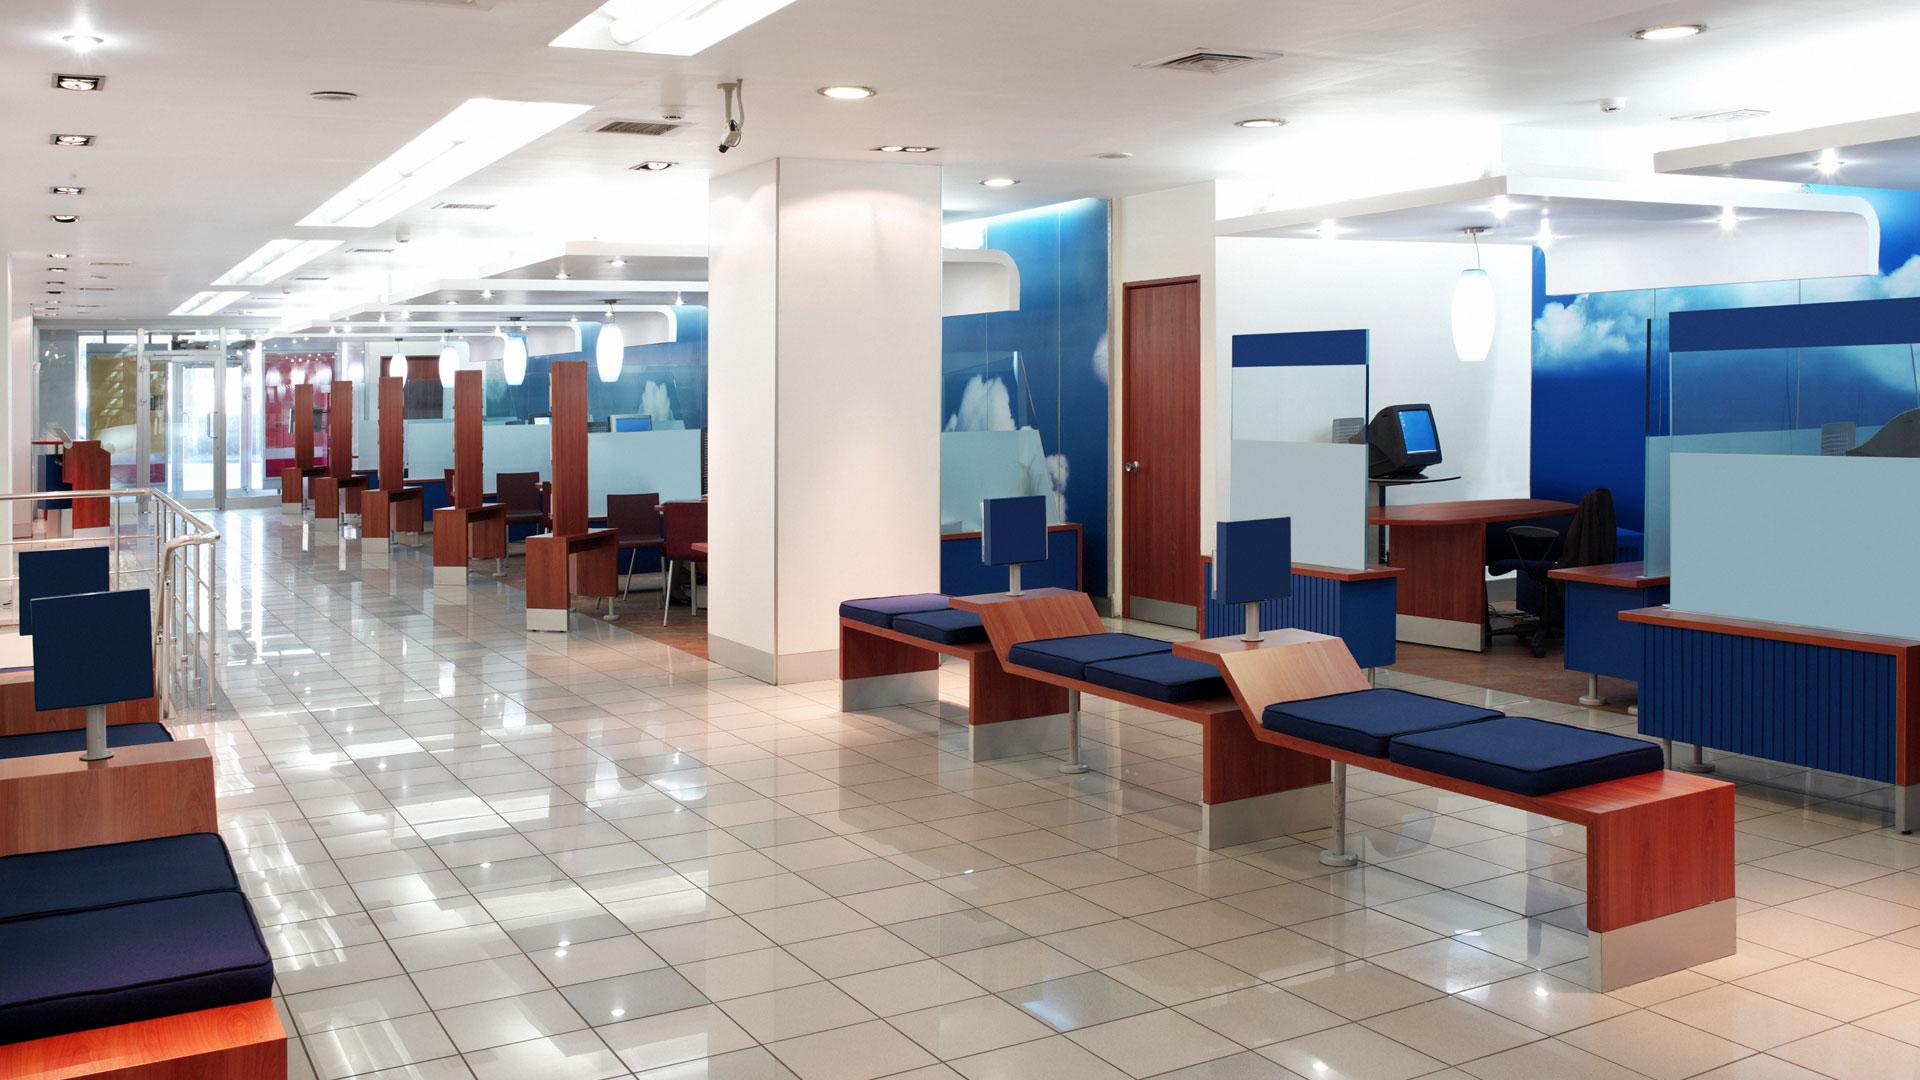 commercial interior designing company kottayam kerala india rh diyadesignz com